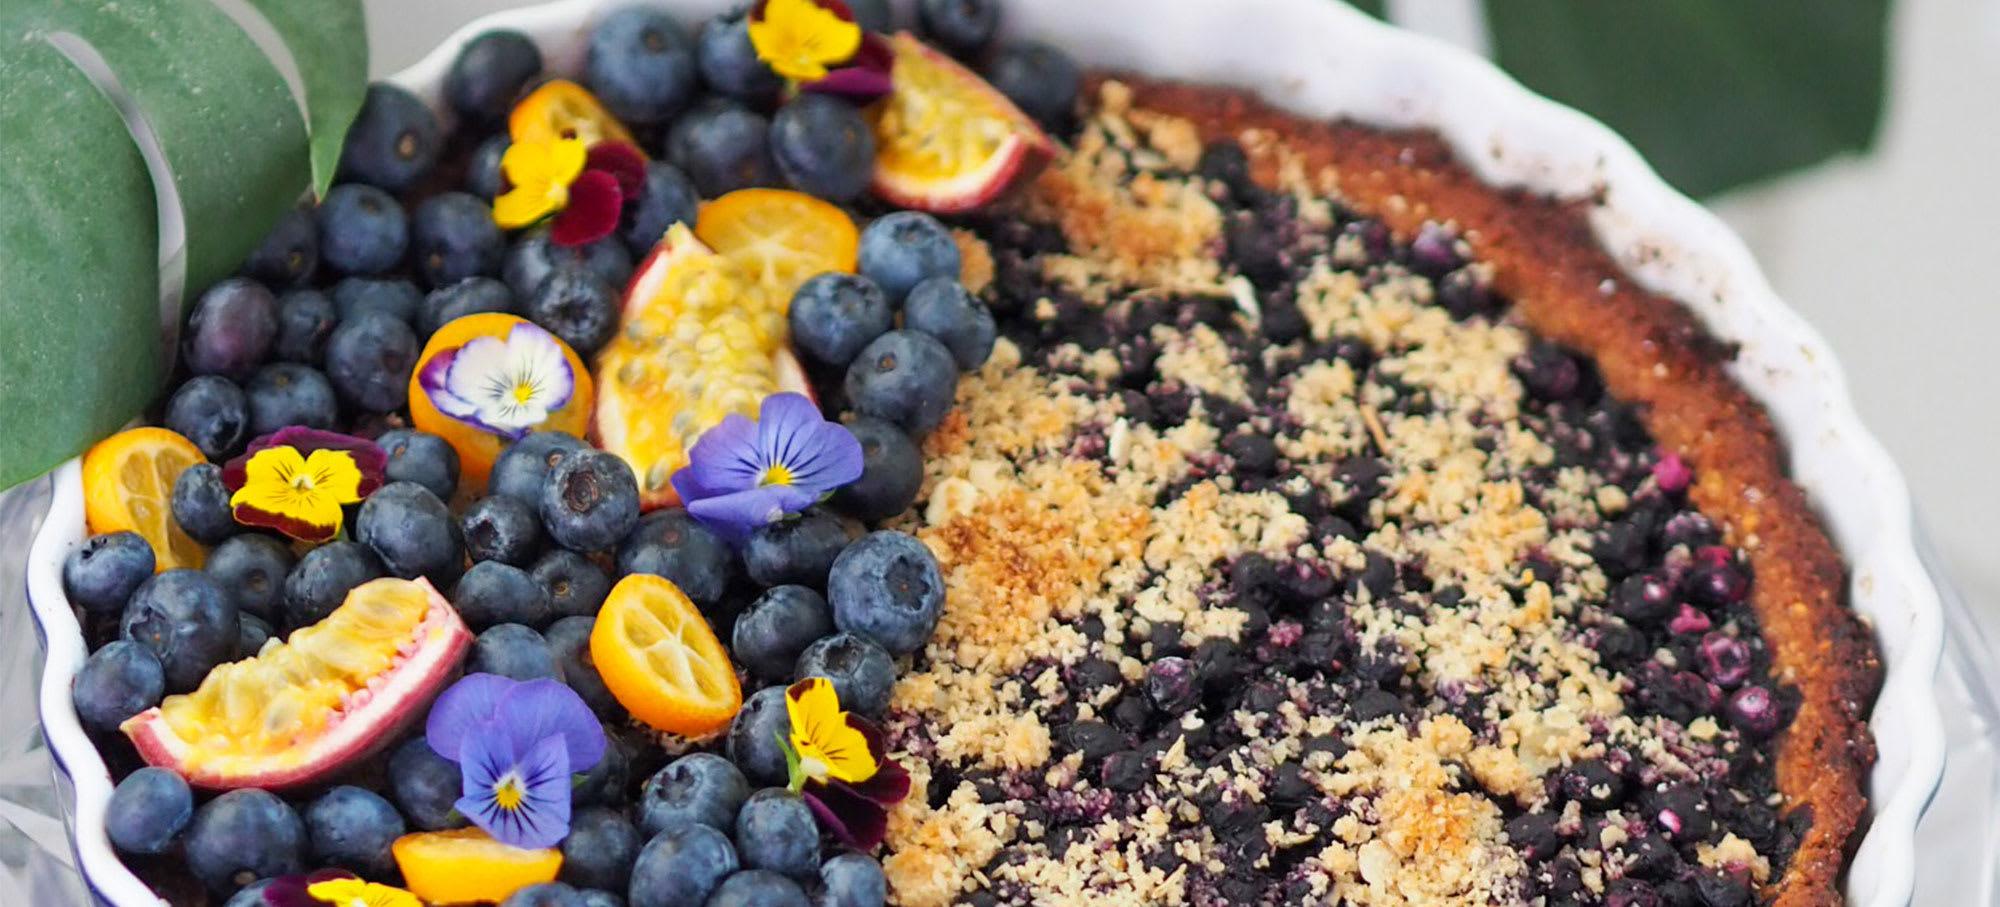 Blåbær crumble tærte